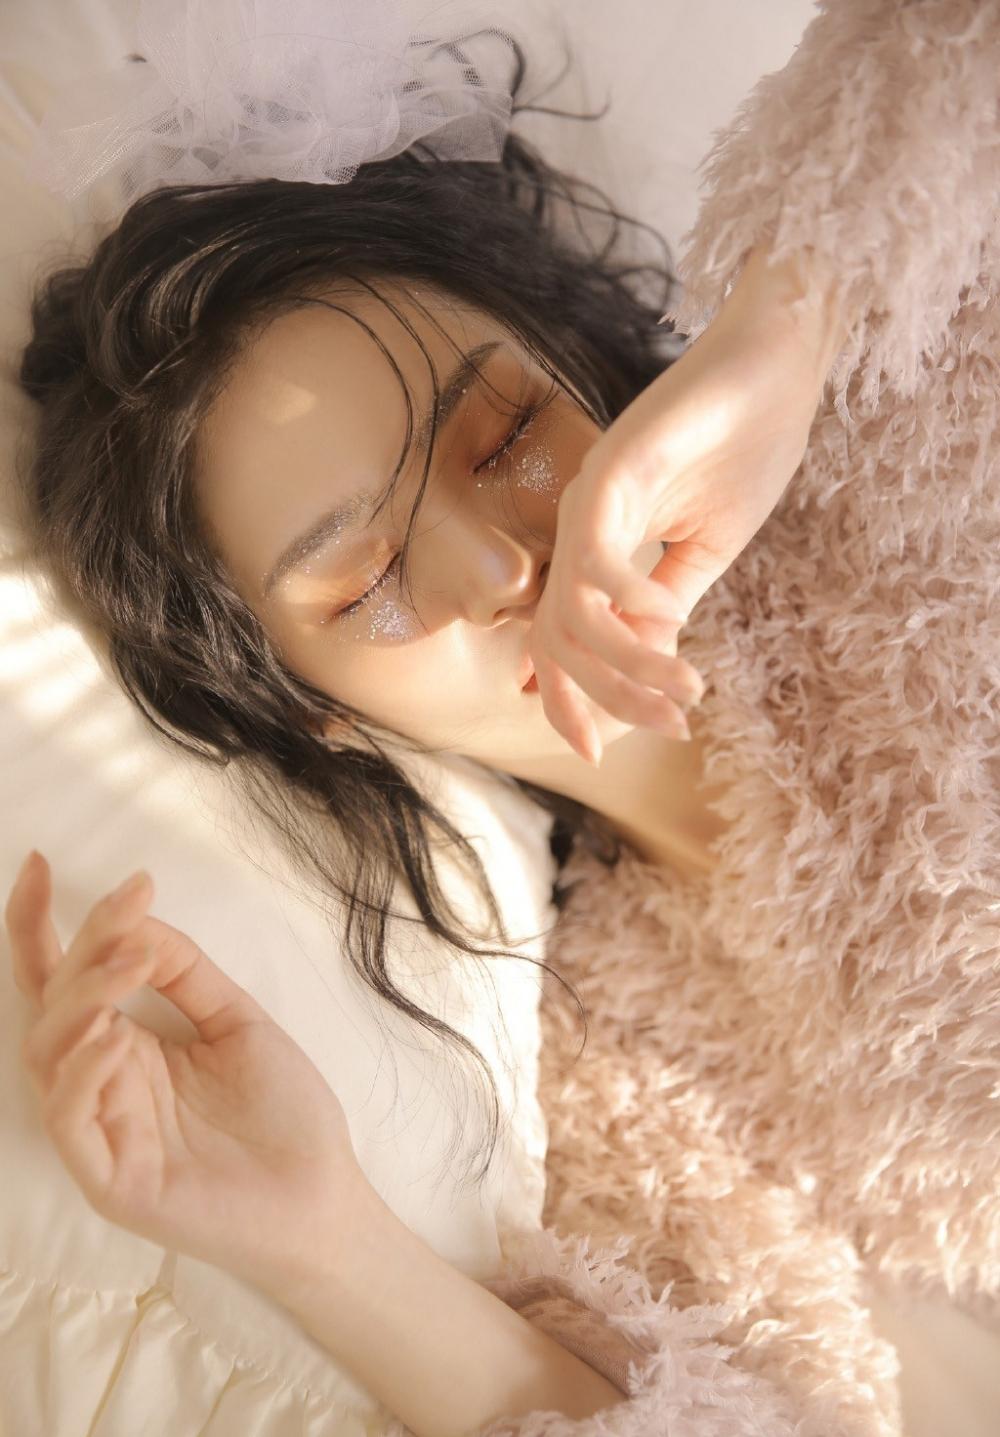 HBAD-439性感摇滚女子 裸露豹纹内衣火辣撩人